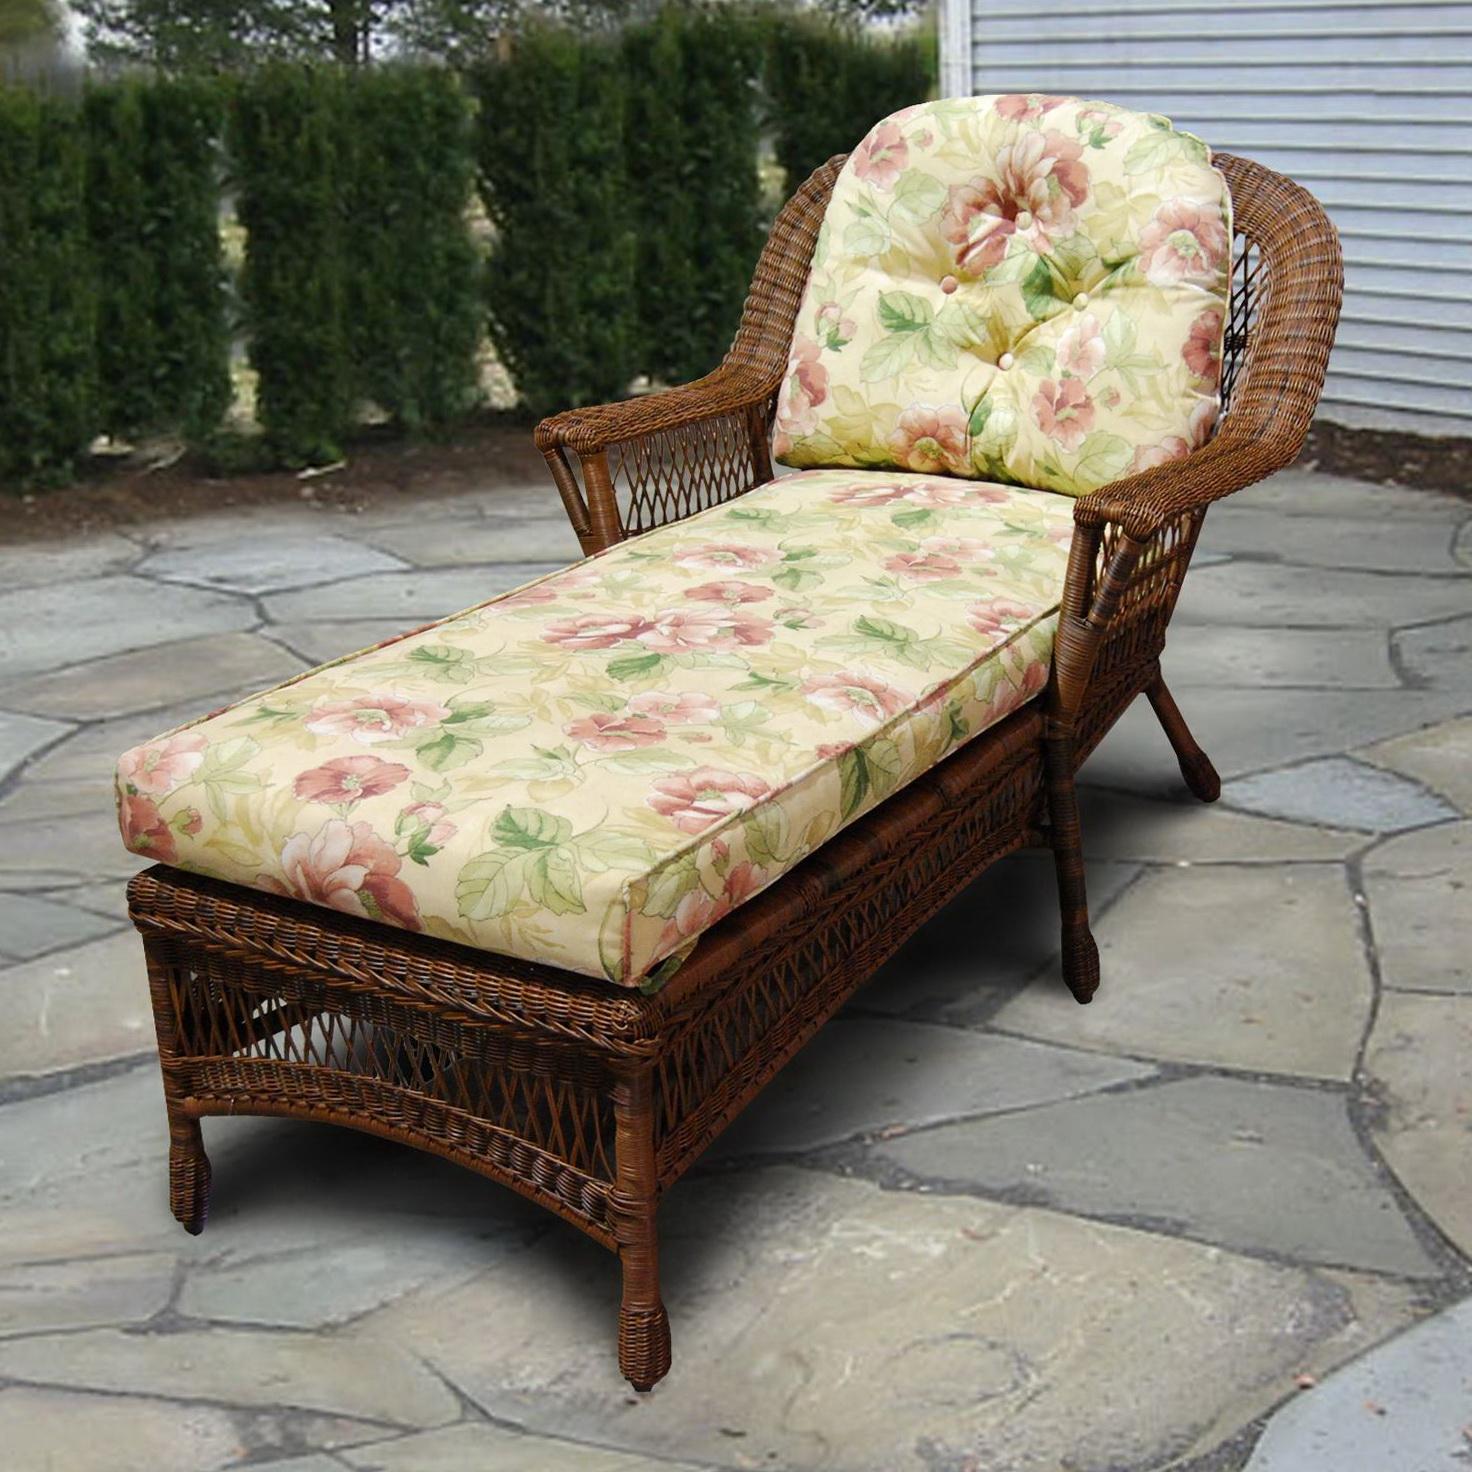 Antique Wicker Chaise Lounge Home Design Ideas